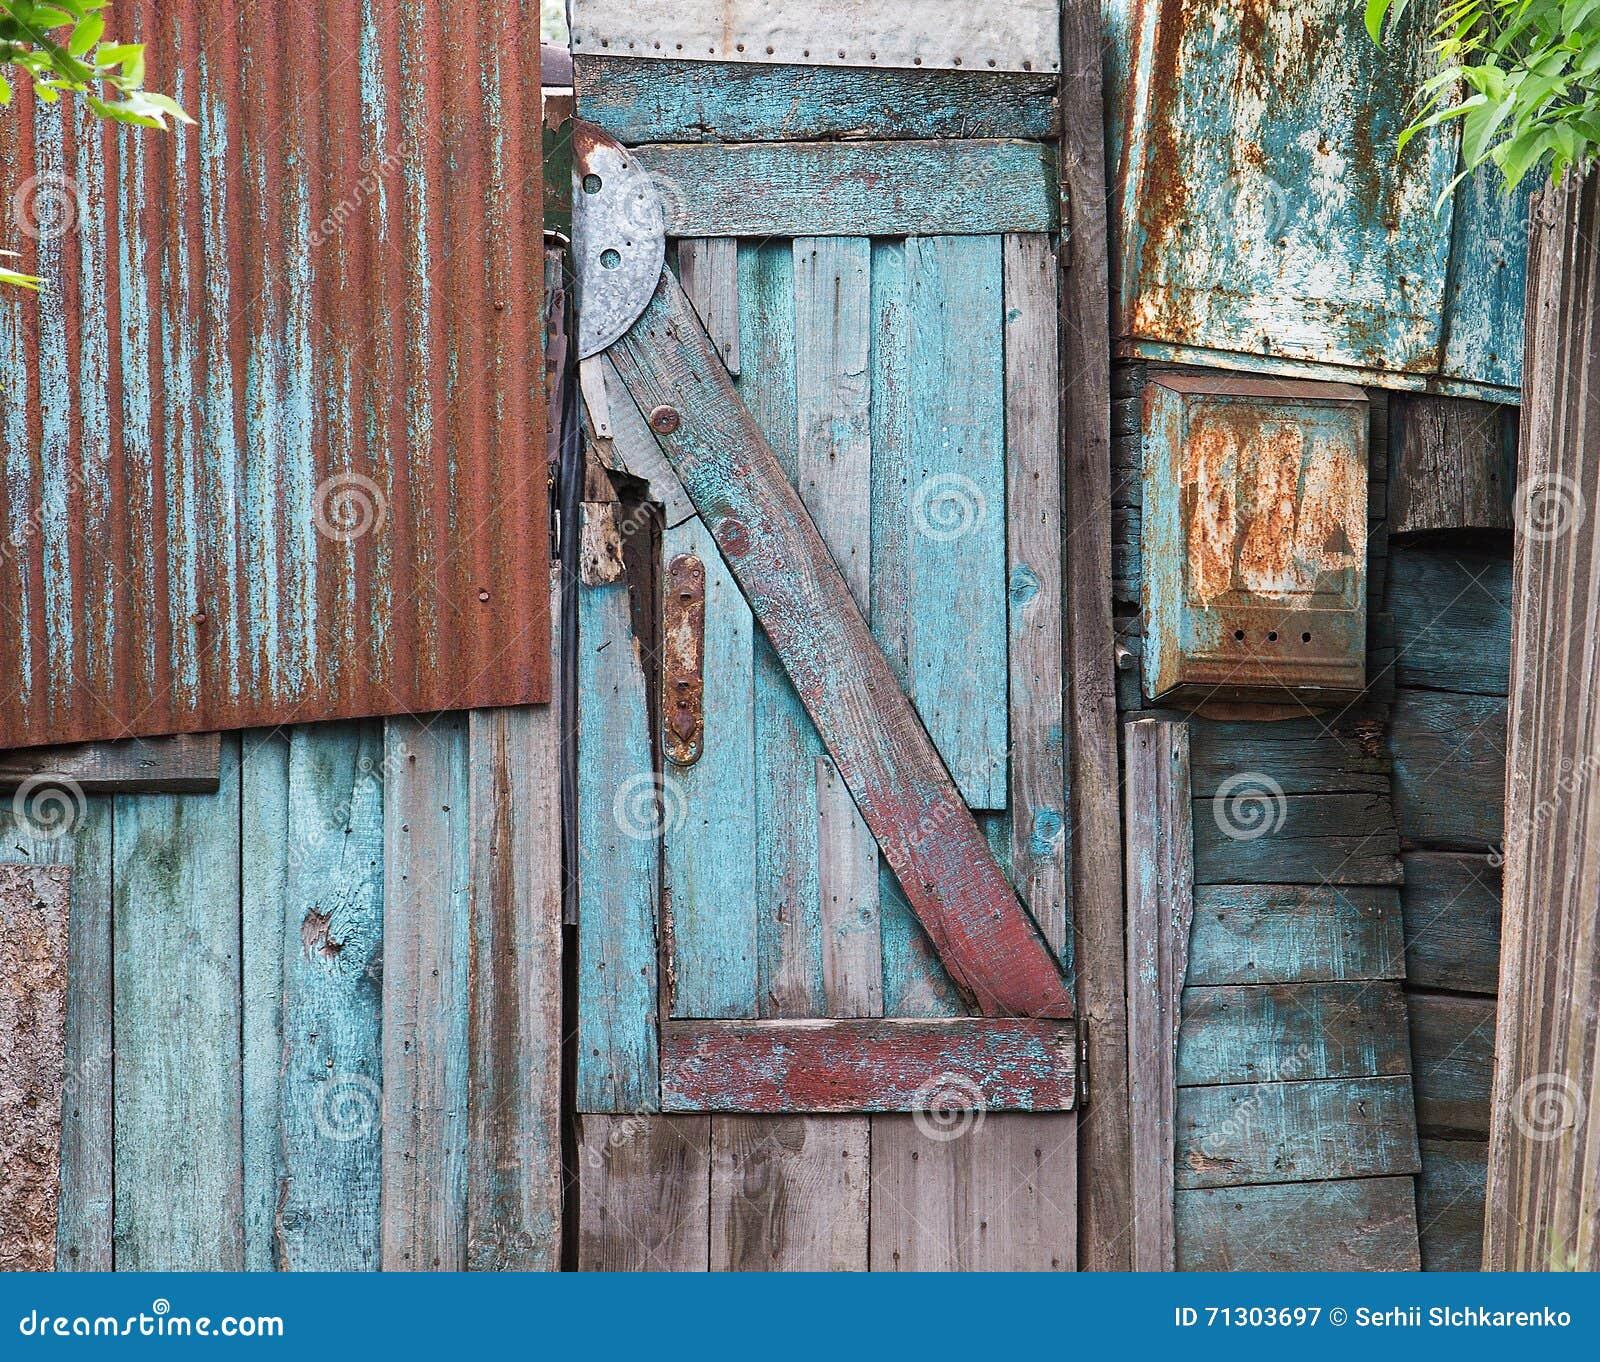 Puertas de madera viejas textura o fondo imagen de for Imagenes de puertas viejas